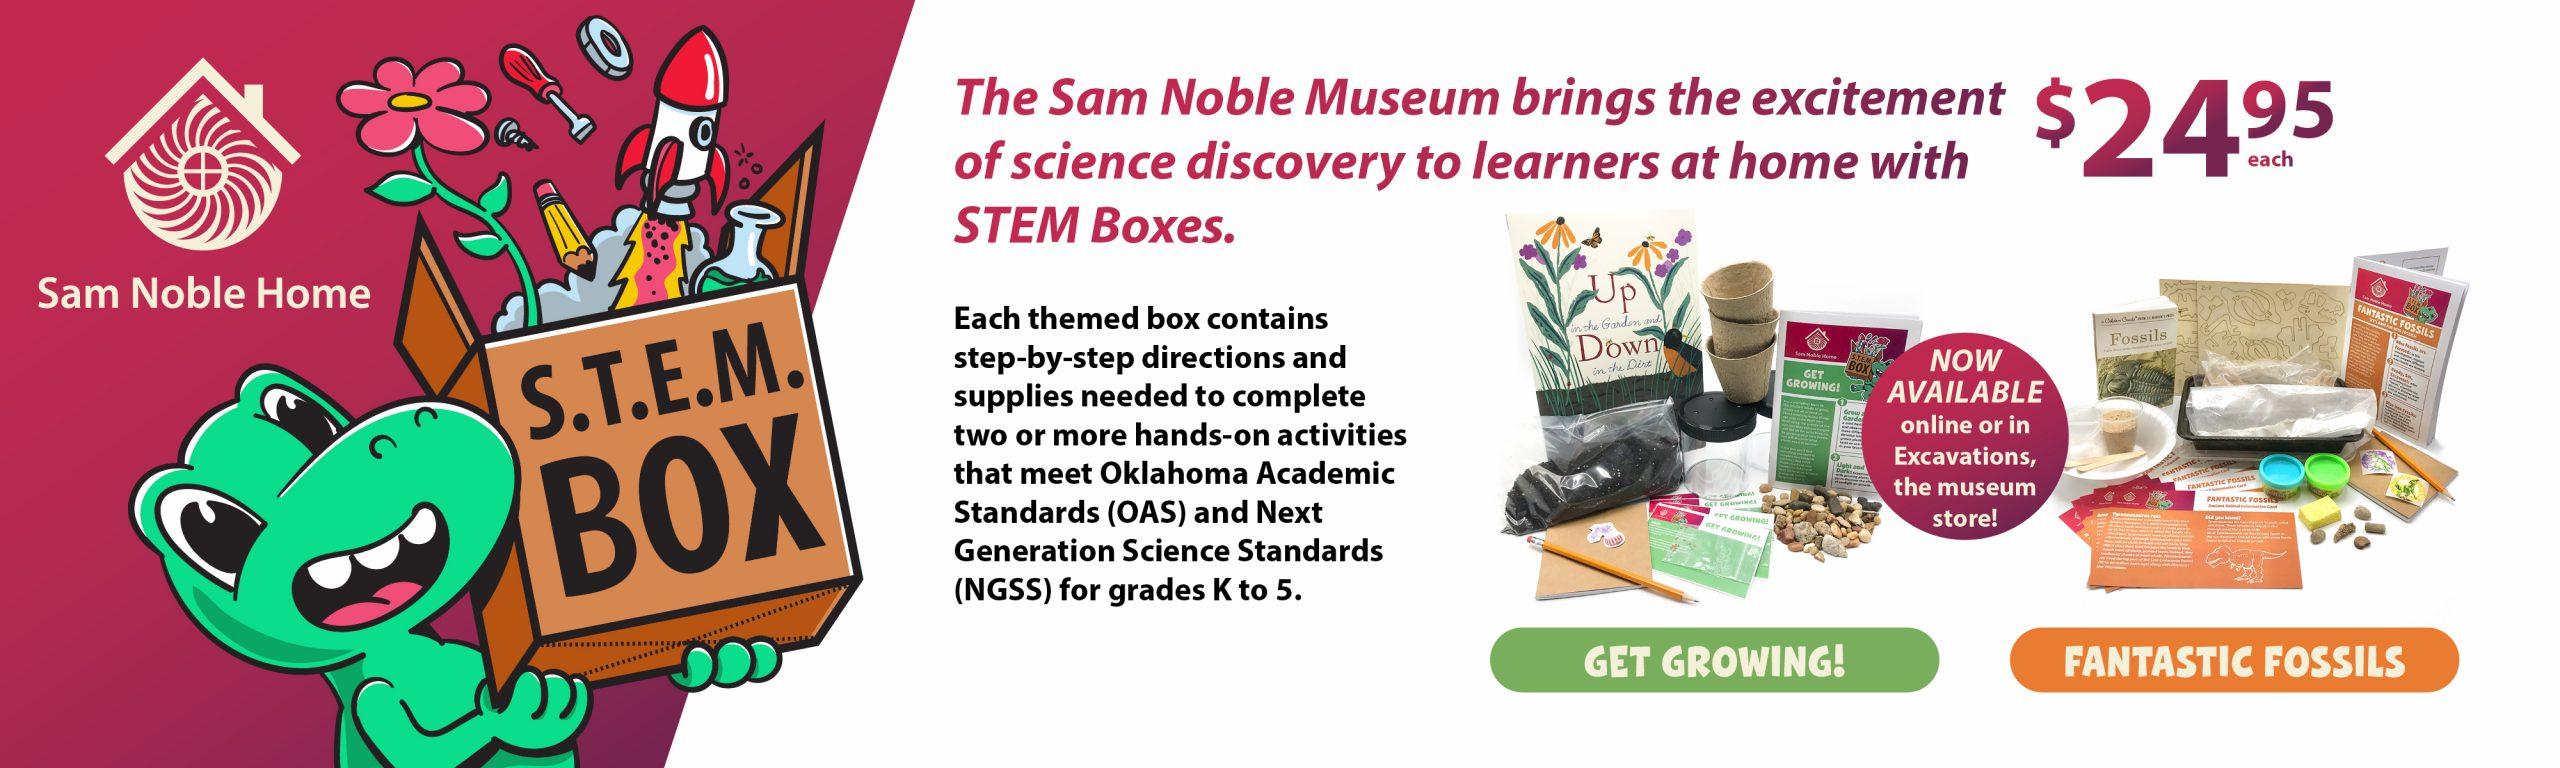 Stem Boxes Sam Noble Museum